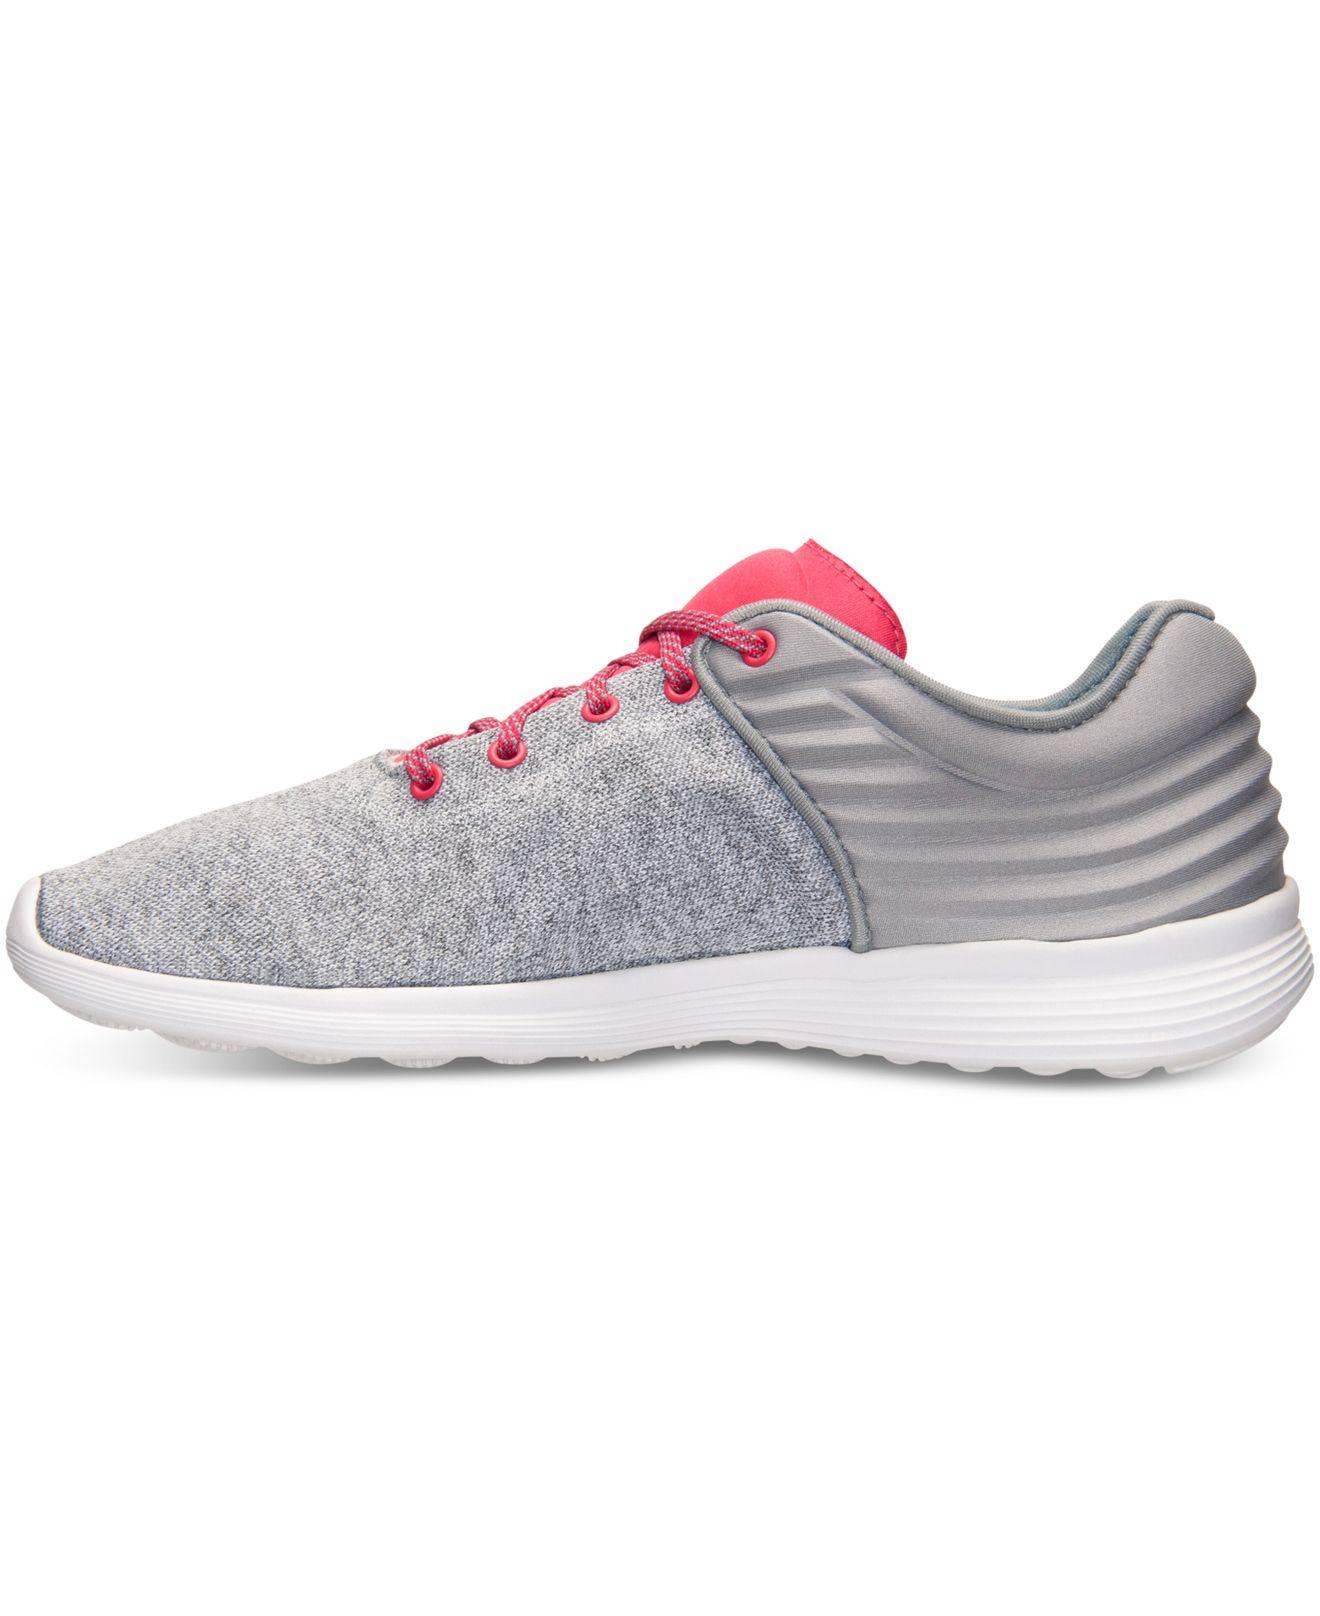 Lyst - Reebok Women s Skyscape Fuse Walking Sneakers From Finish Line in  Pink 8635db5cf